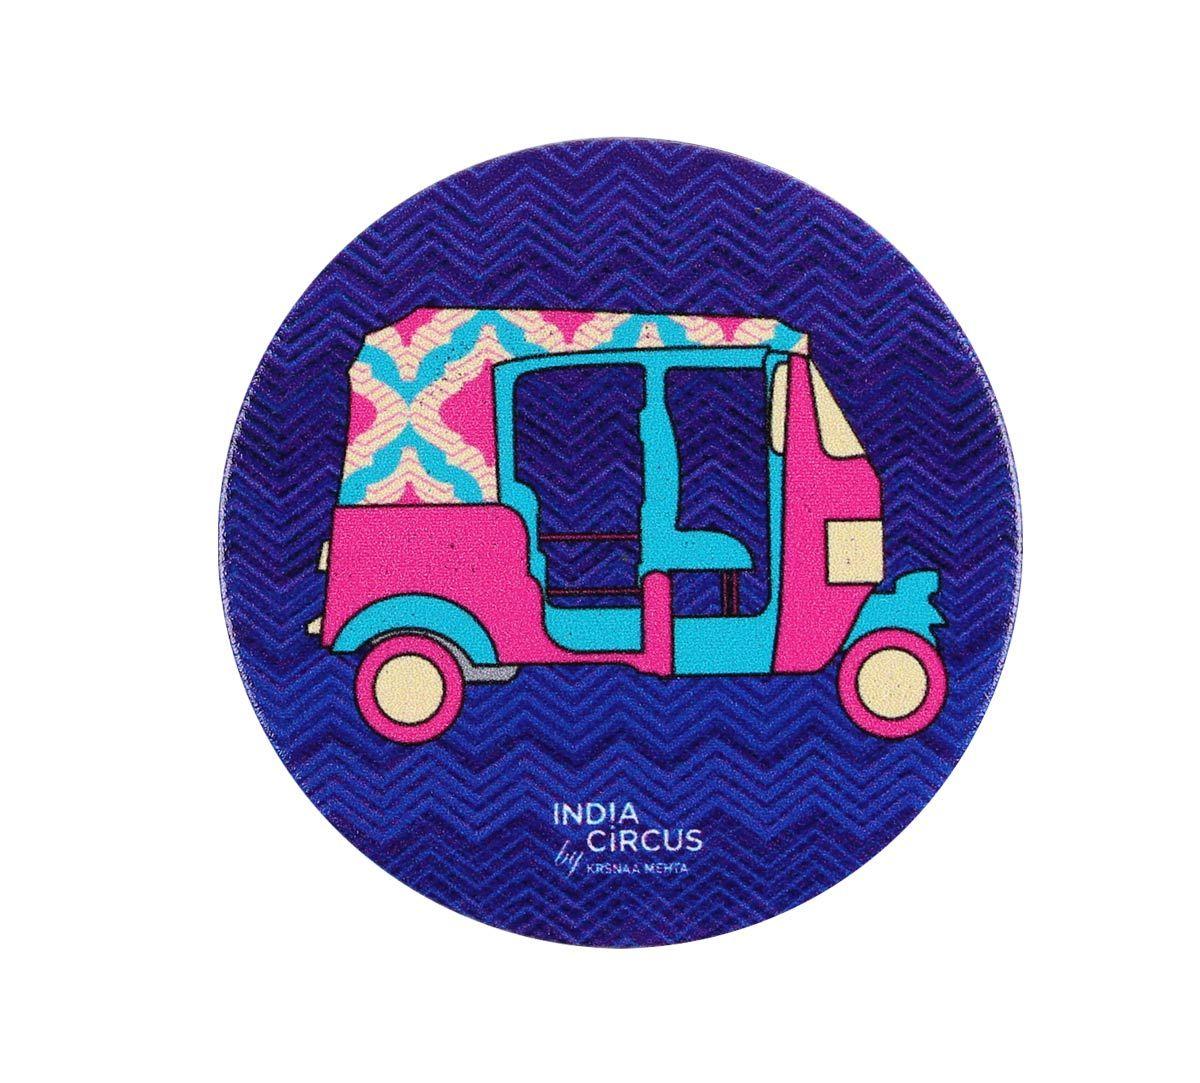 India Circus City Rickshaw Popsocket